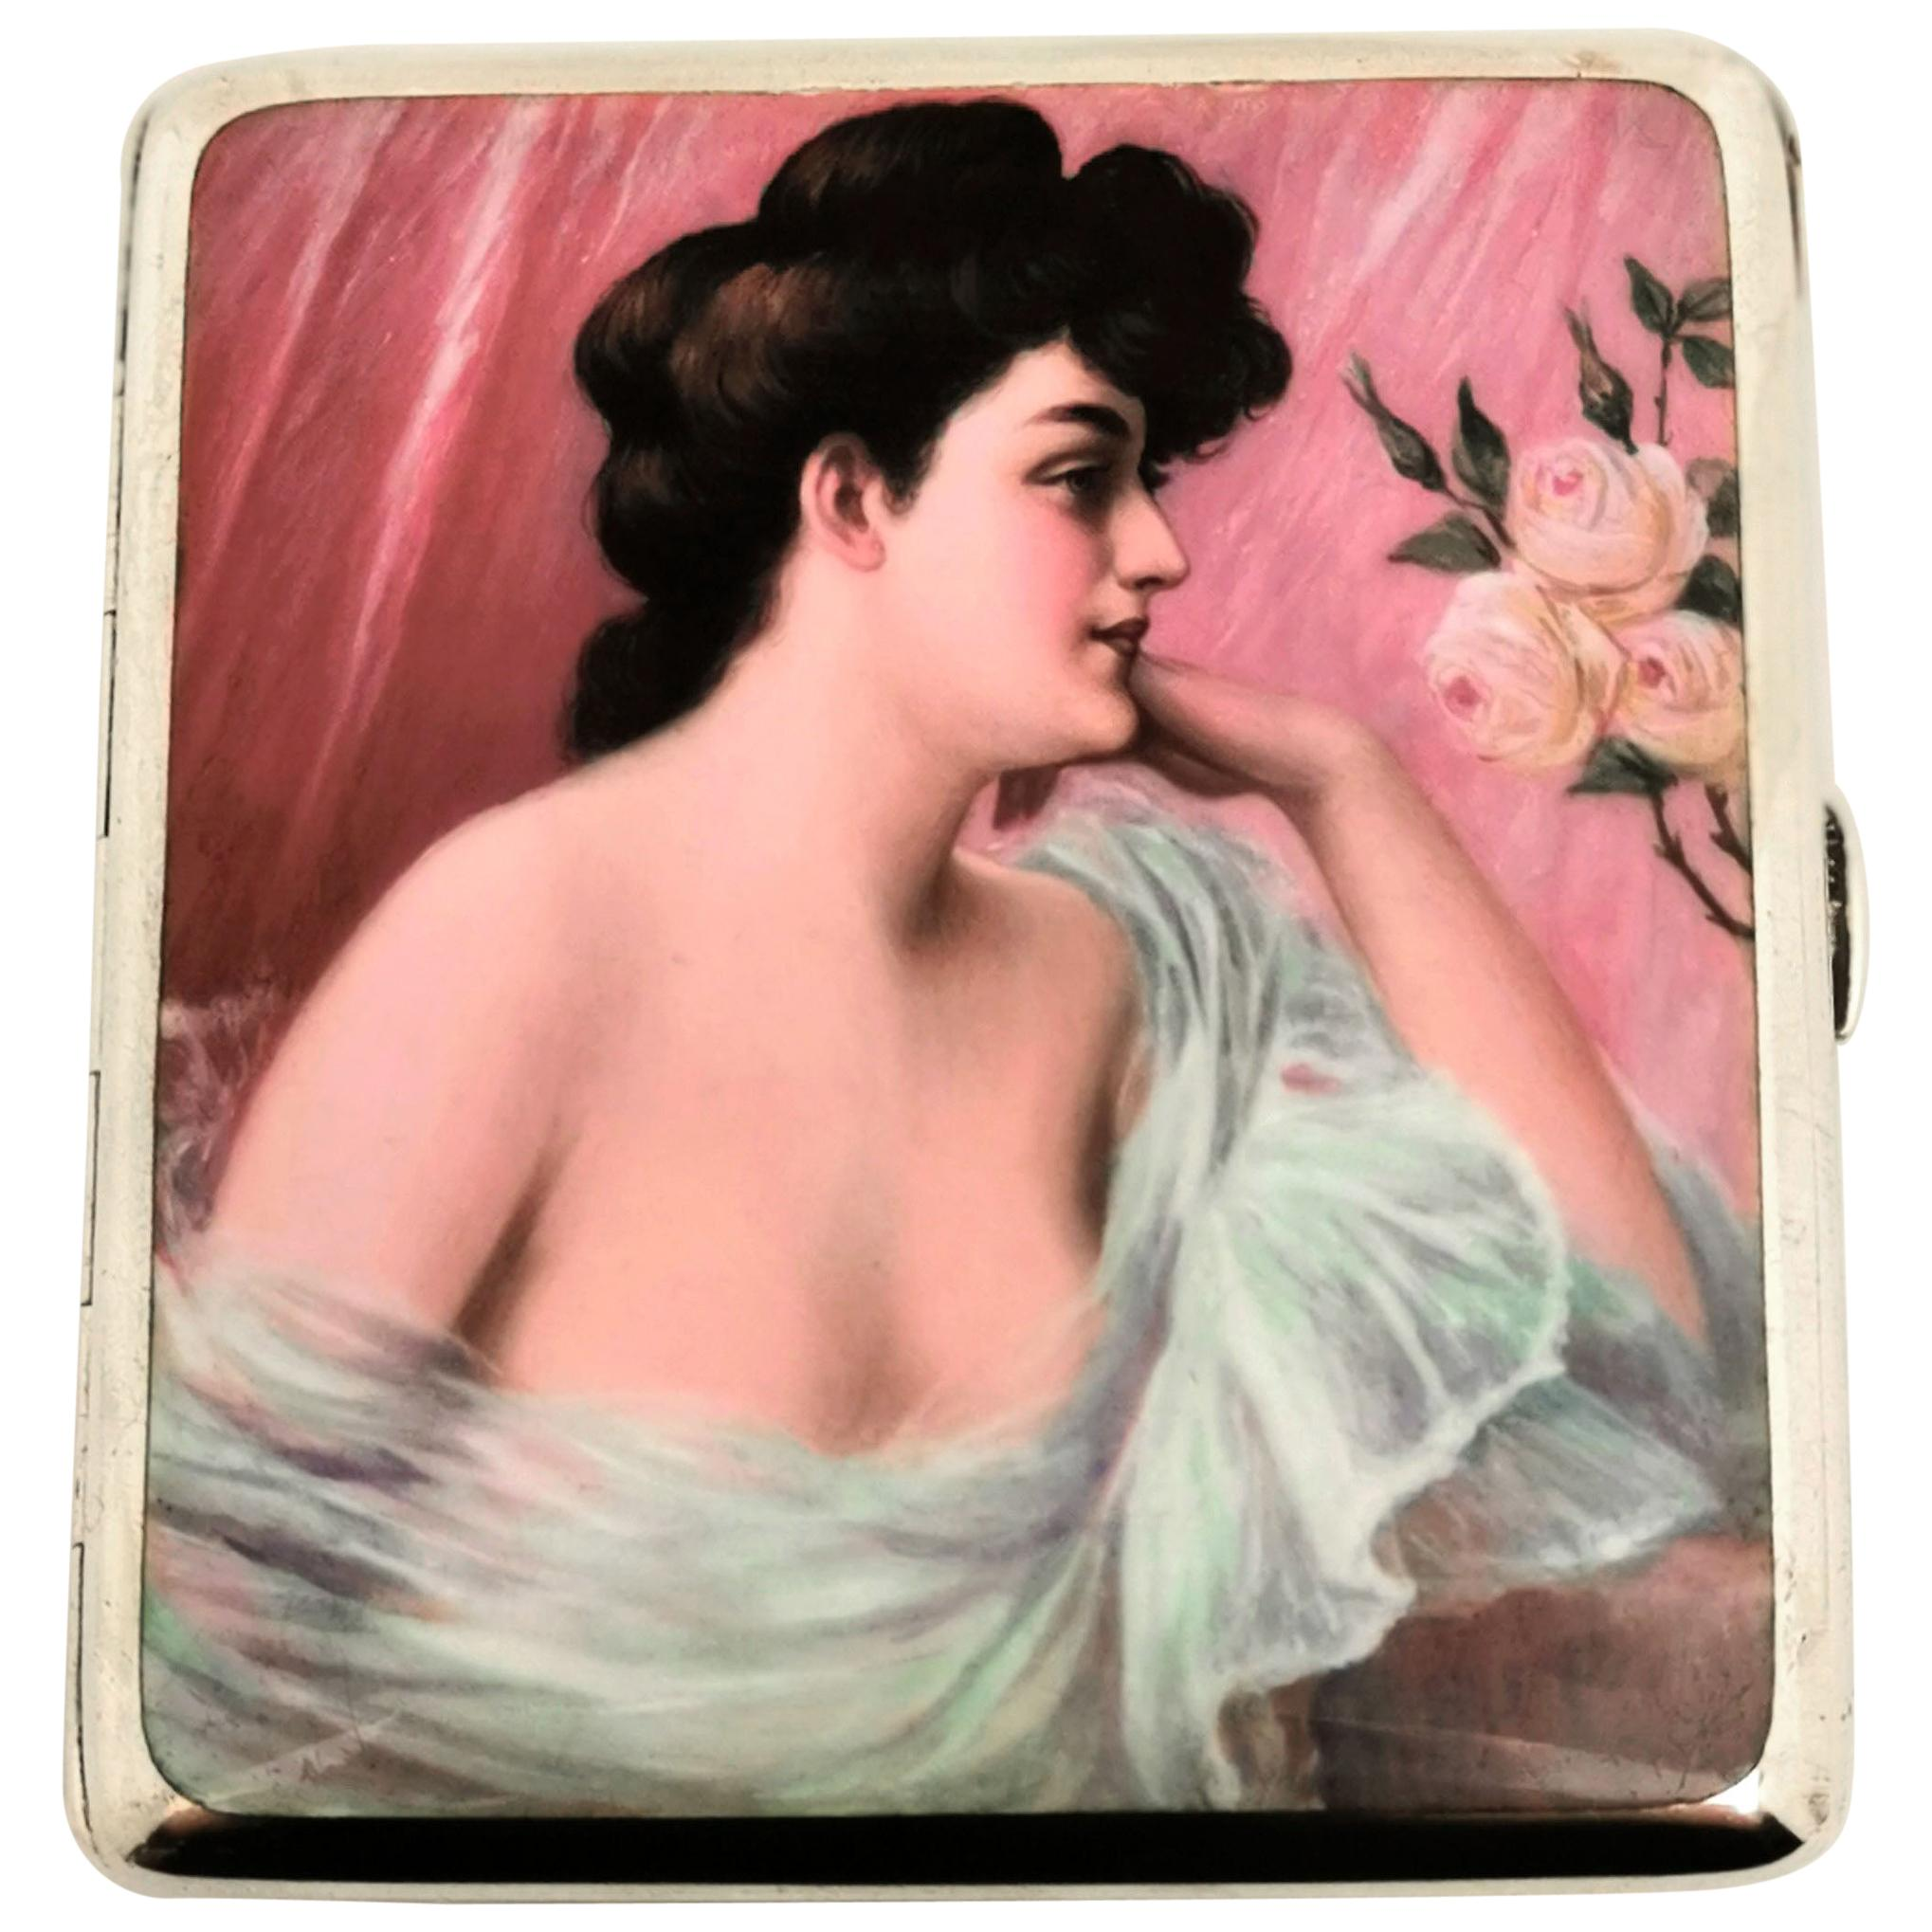 Antique German Solid Silver and Enamel Erotic Cigarette Case c. 1900